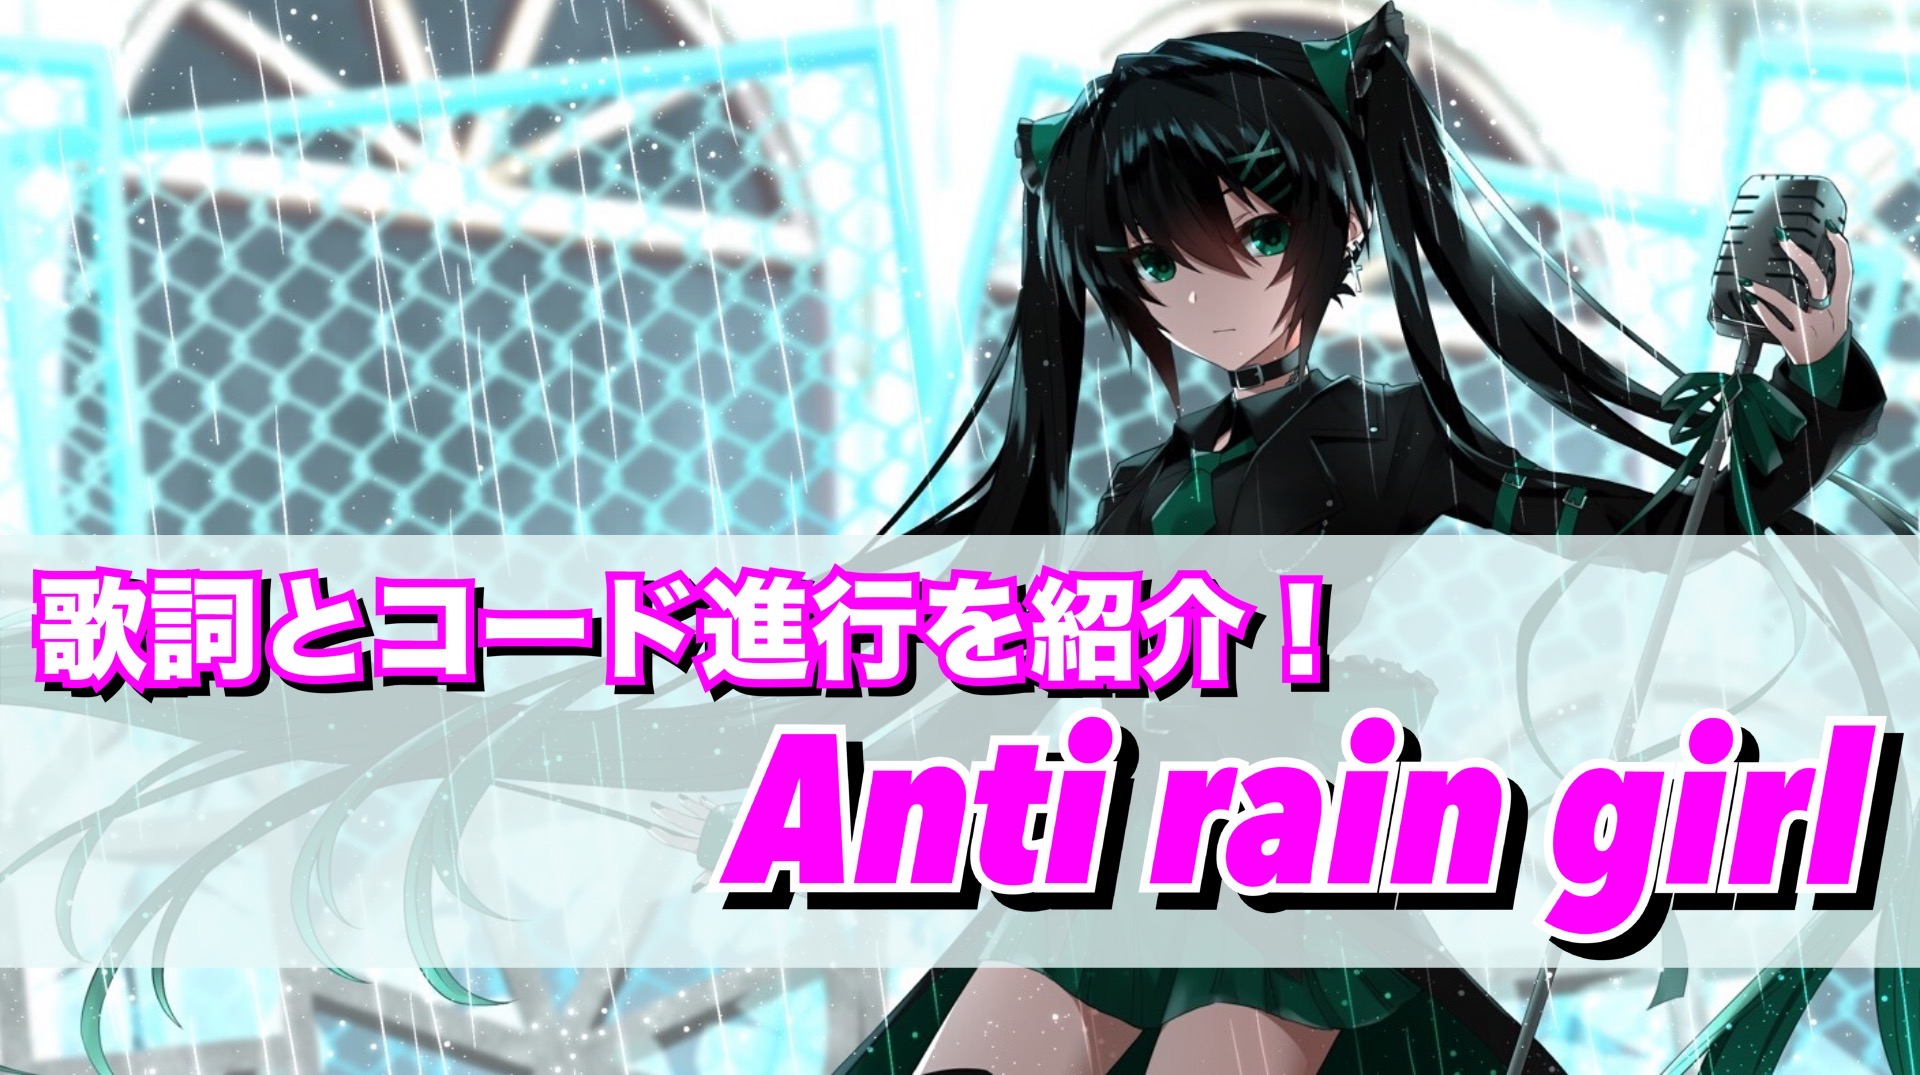 「anti rain girl」の歌詞とコード進行を紹介!